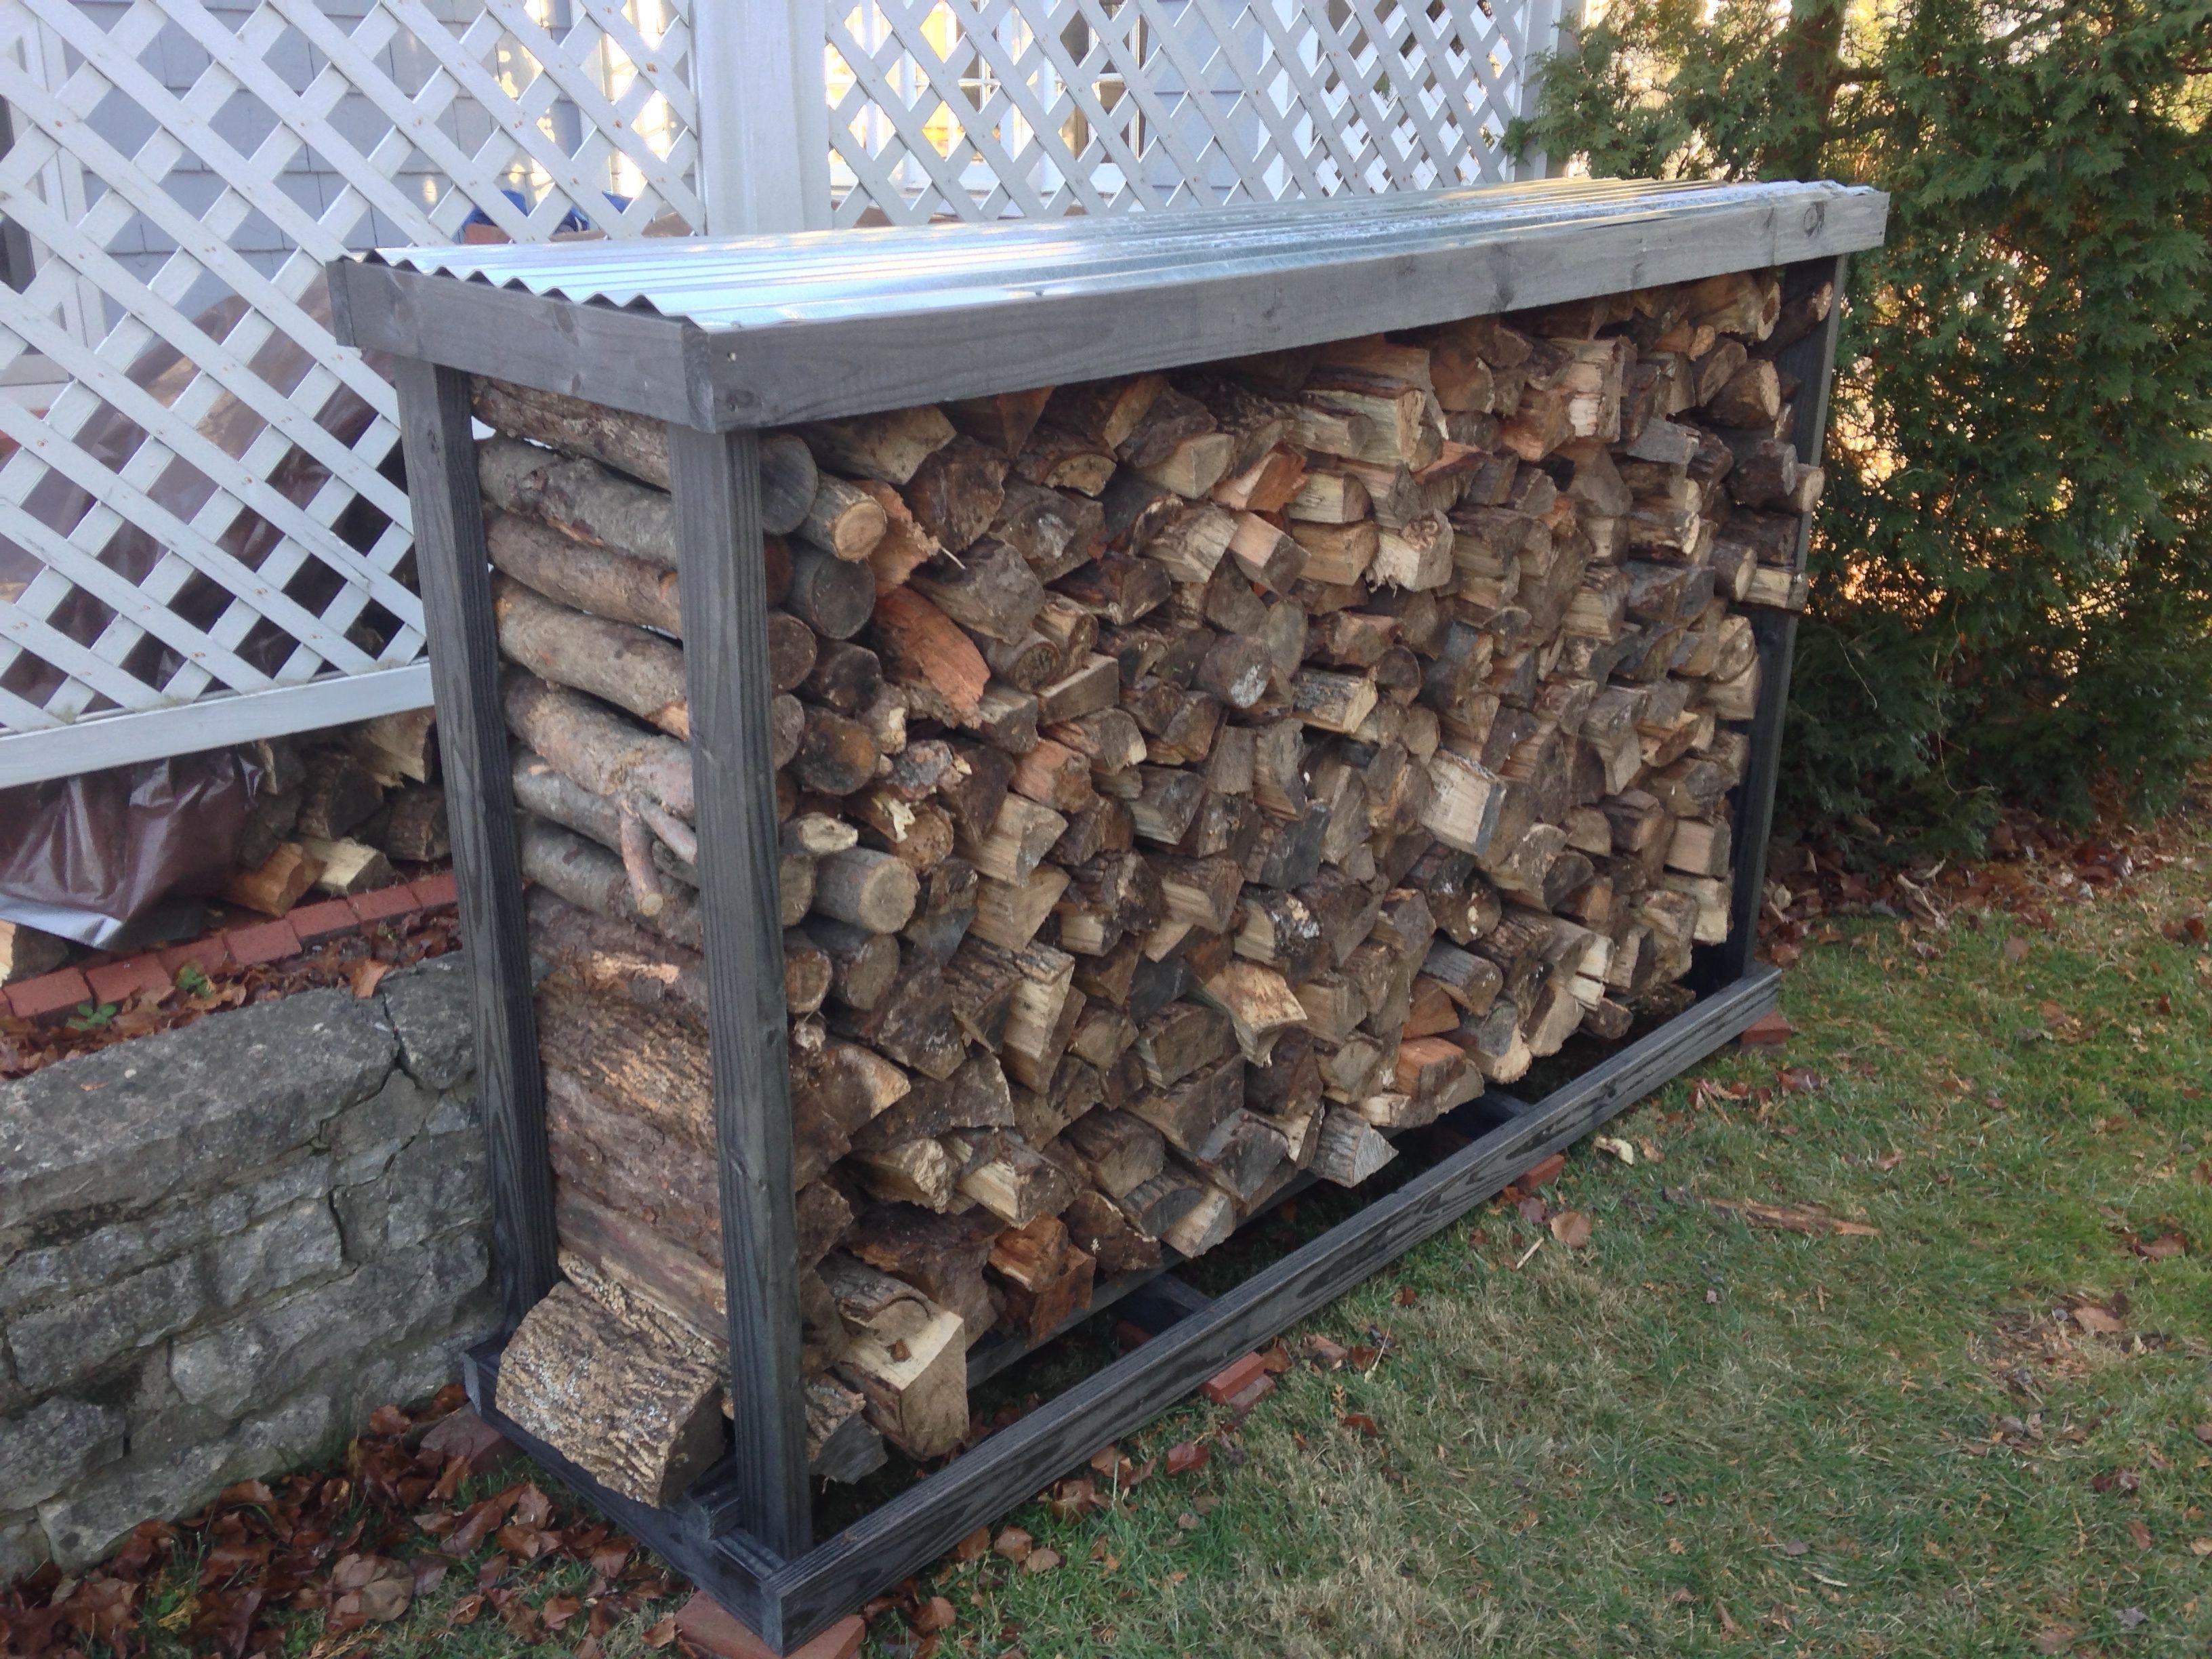 50 homemade firewood rack 4x 2x4x5 treated lumber